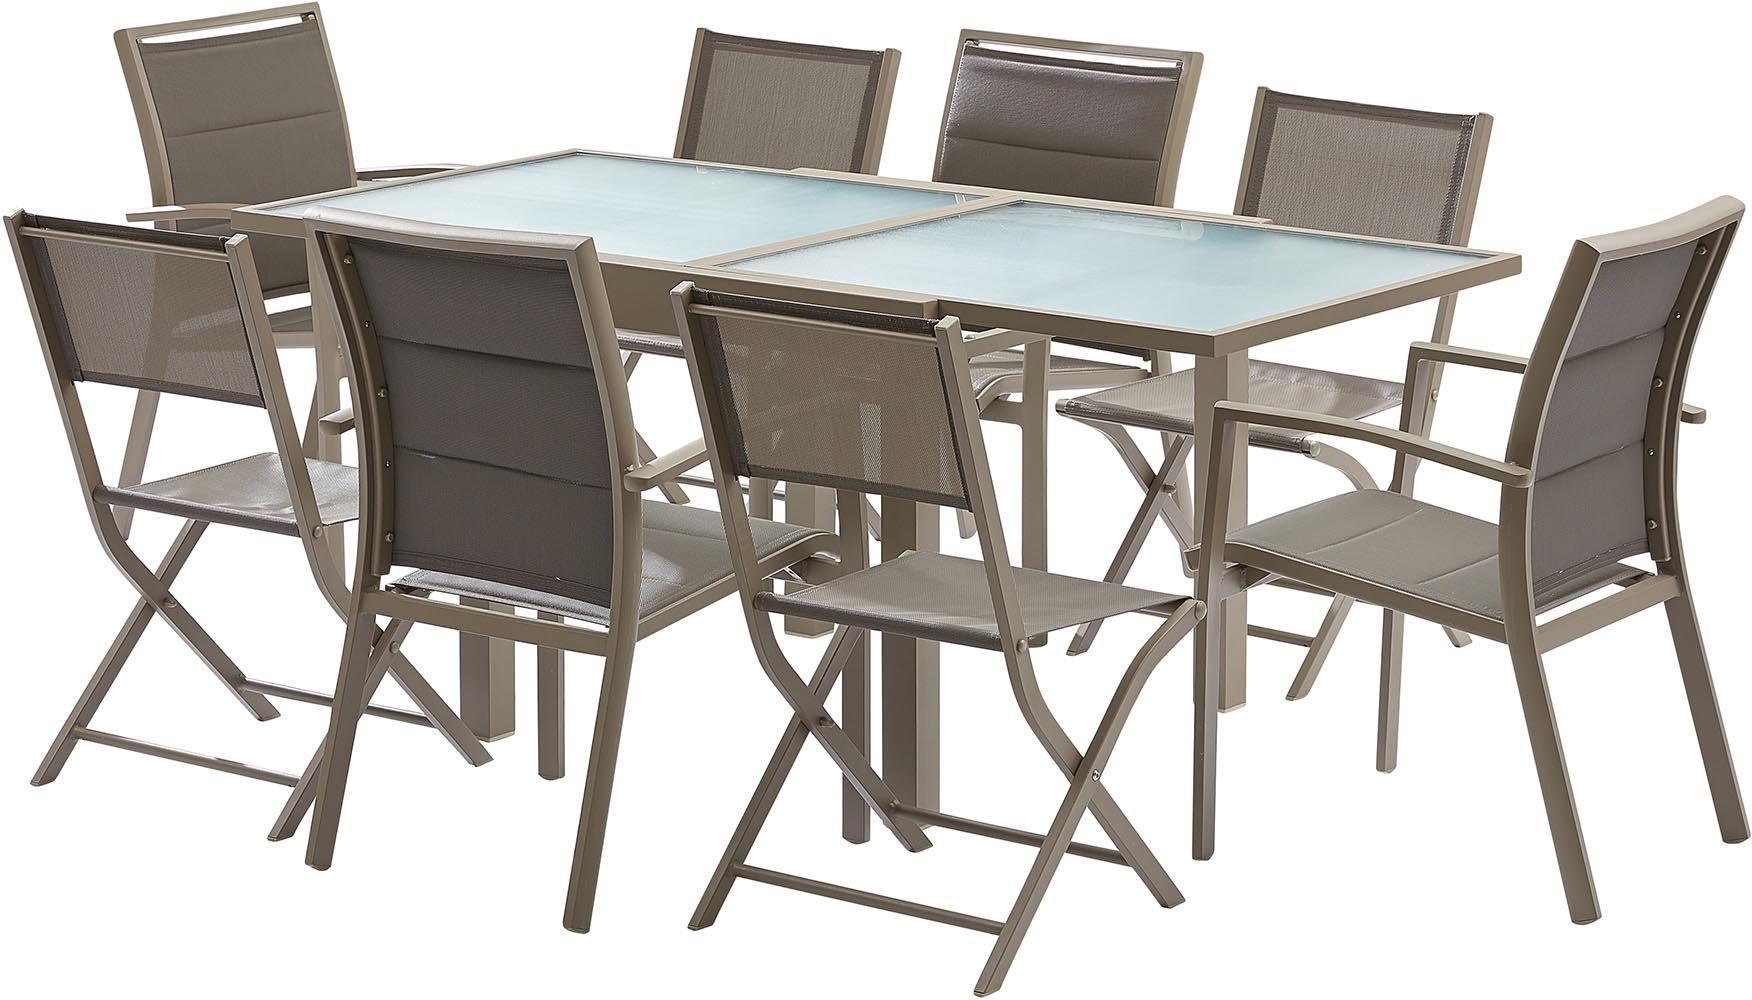 salon de jardin design 8 personnes modulo taupe. Black Bedroom Furniture Sets. Home Design Ideas